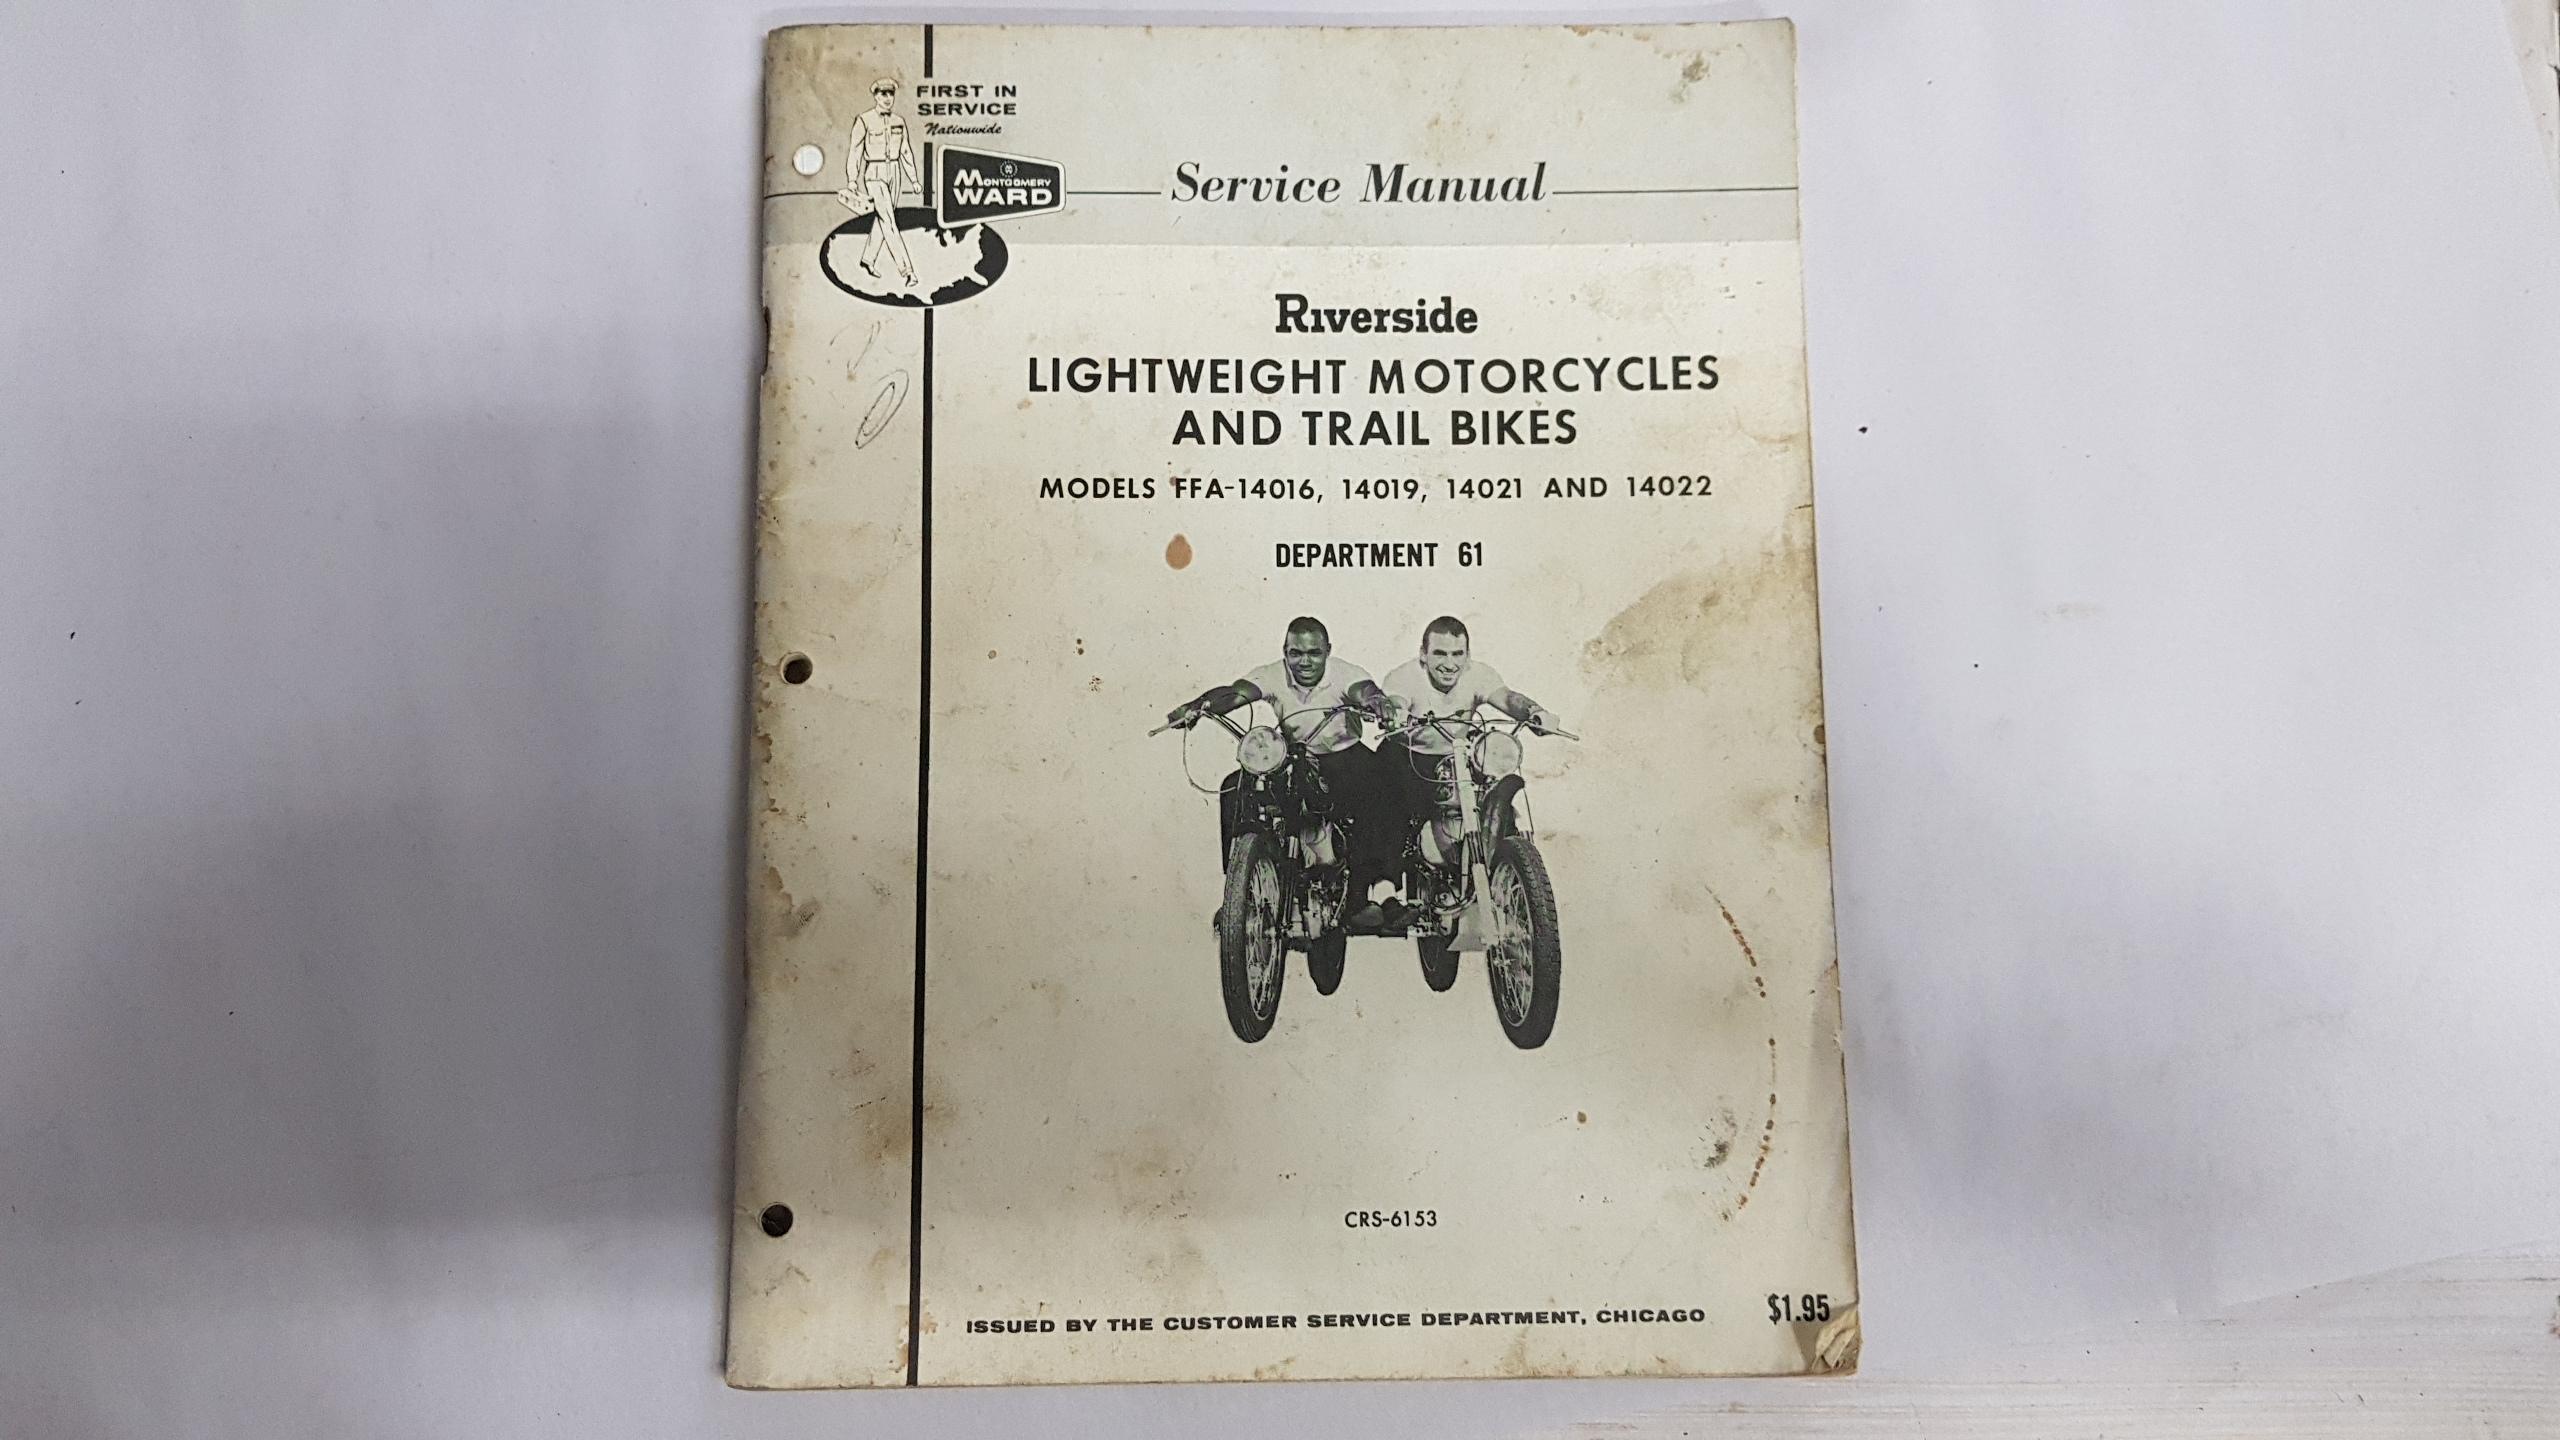 MONTGOMERY WARD RIVERSIDE MOTORCYCLE SERVICE MANUAL